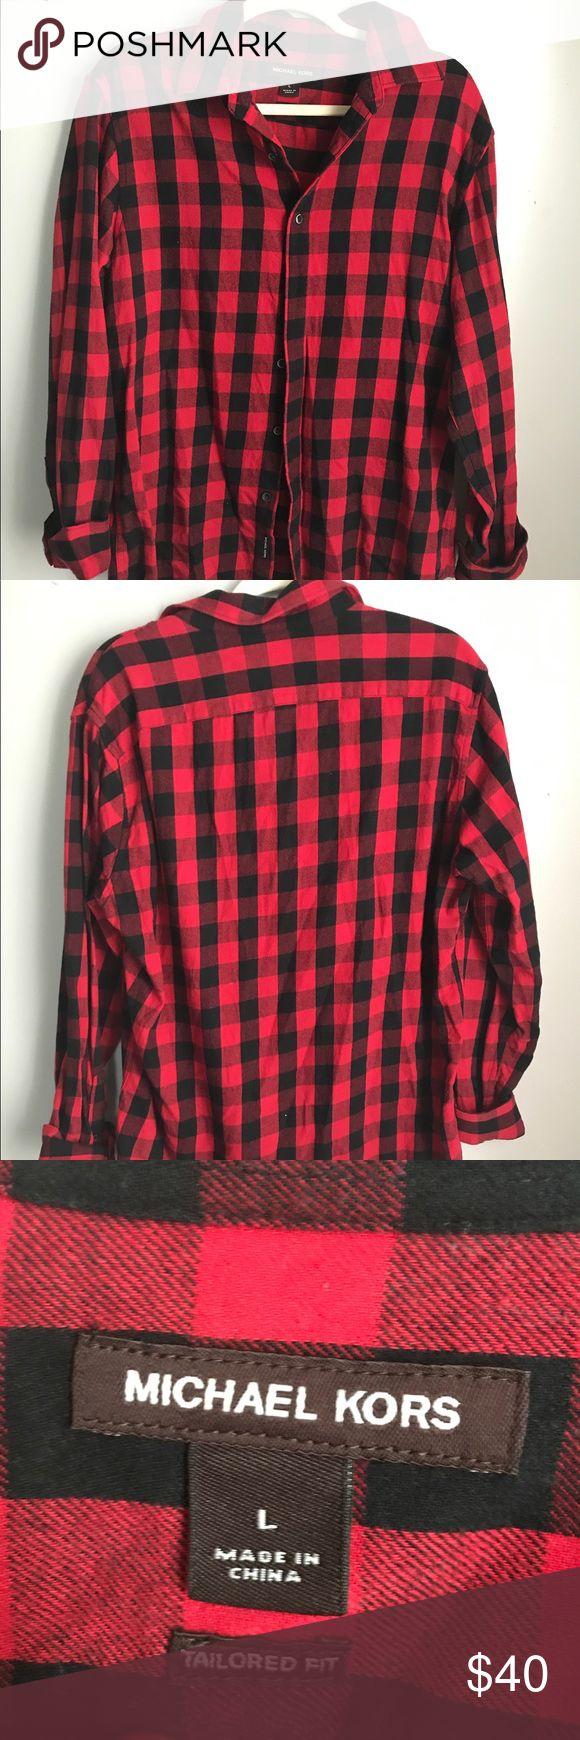 Michael Kors Men plaid shirt Barely worn a few times. In very good condition Michael Kors Shirts Casual Button Down Shirts